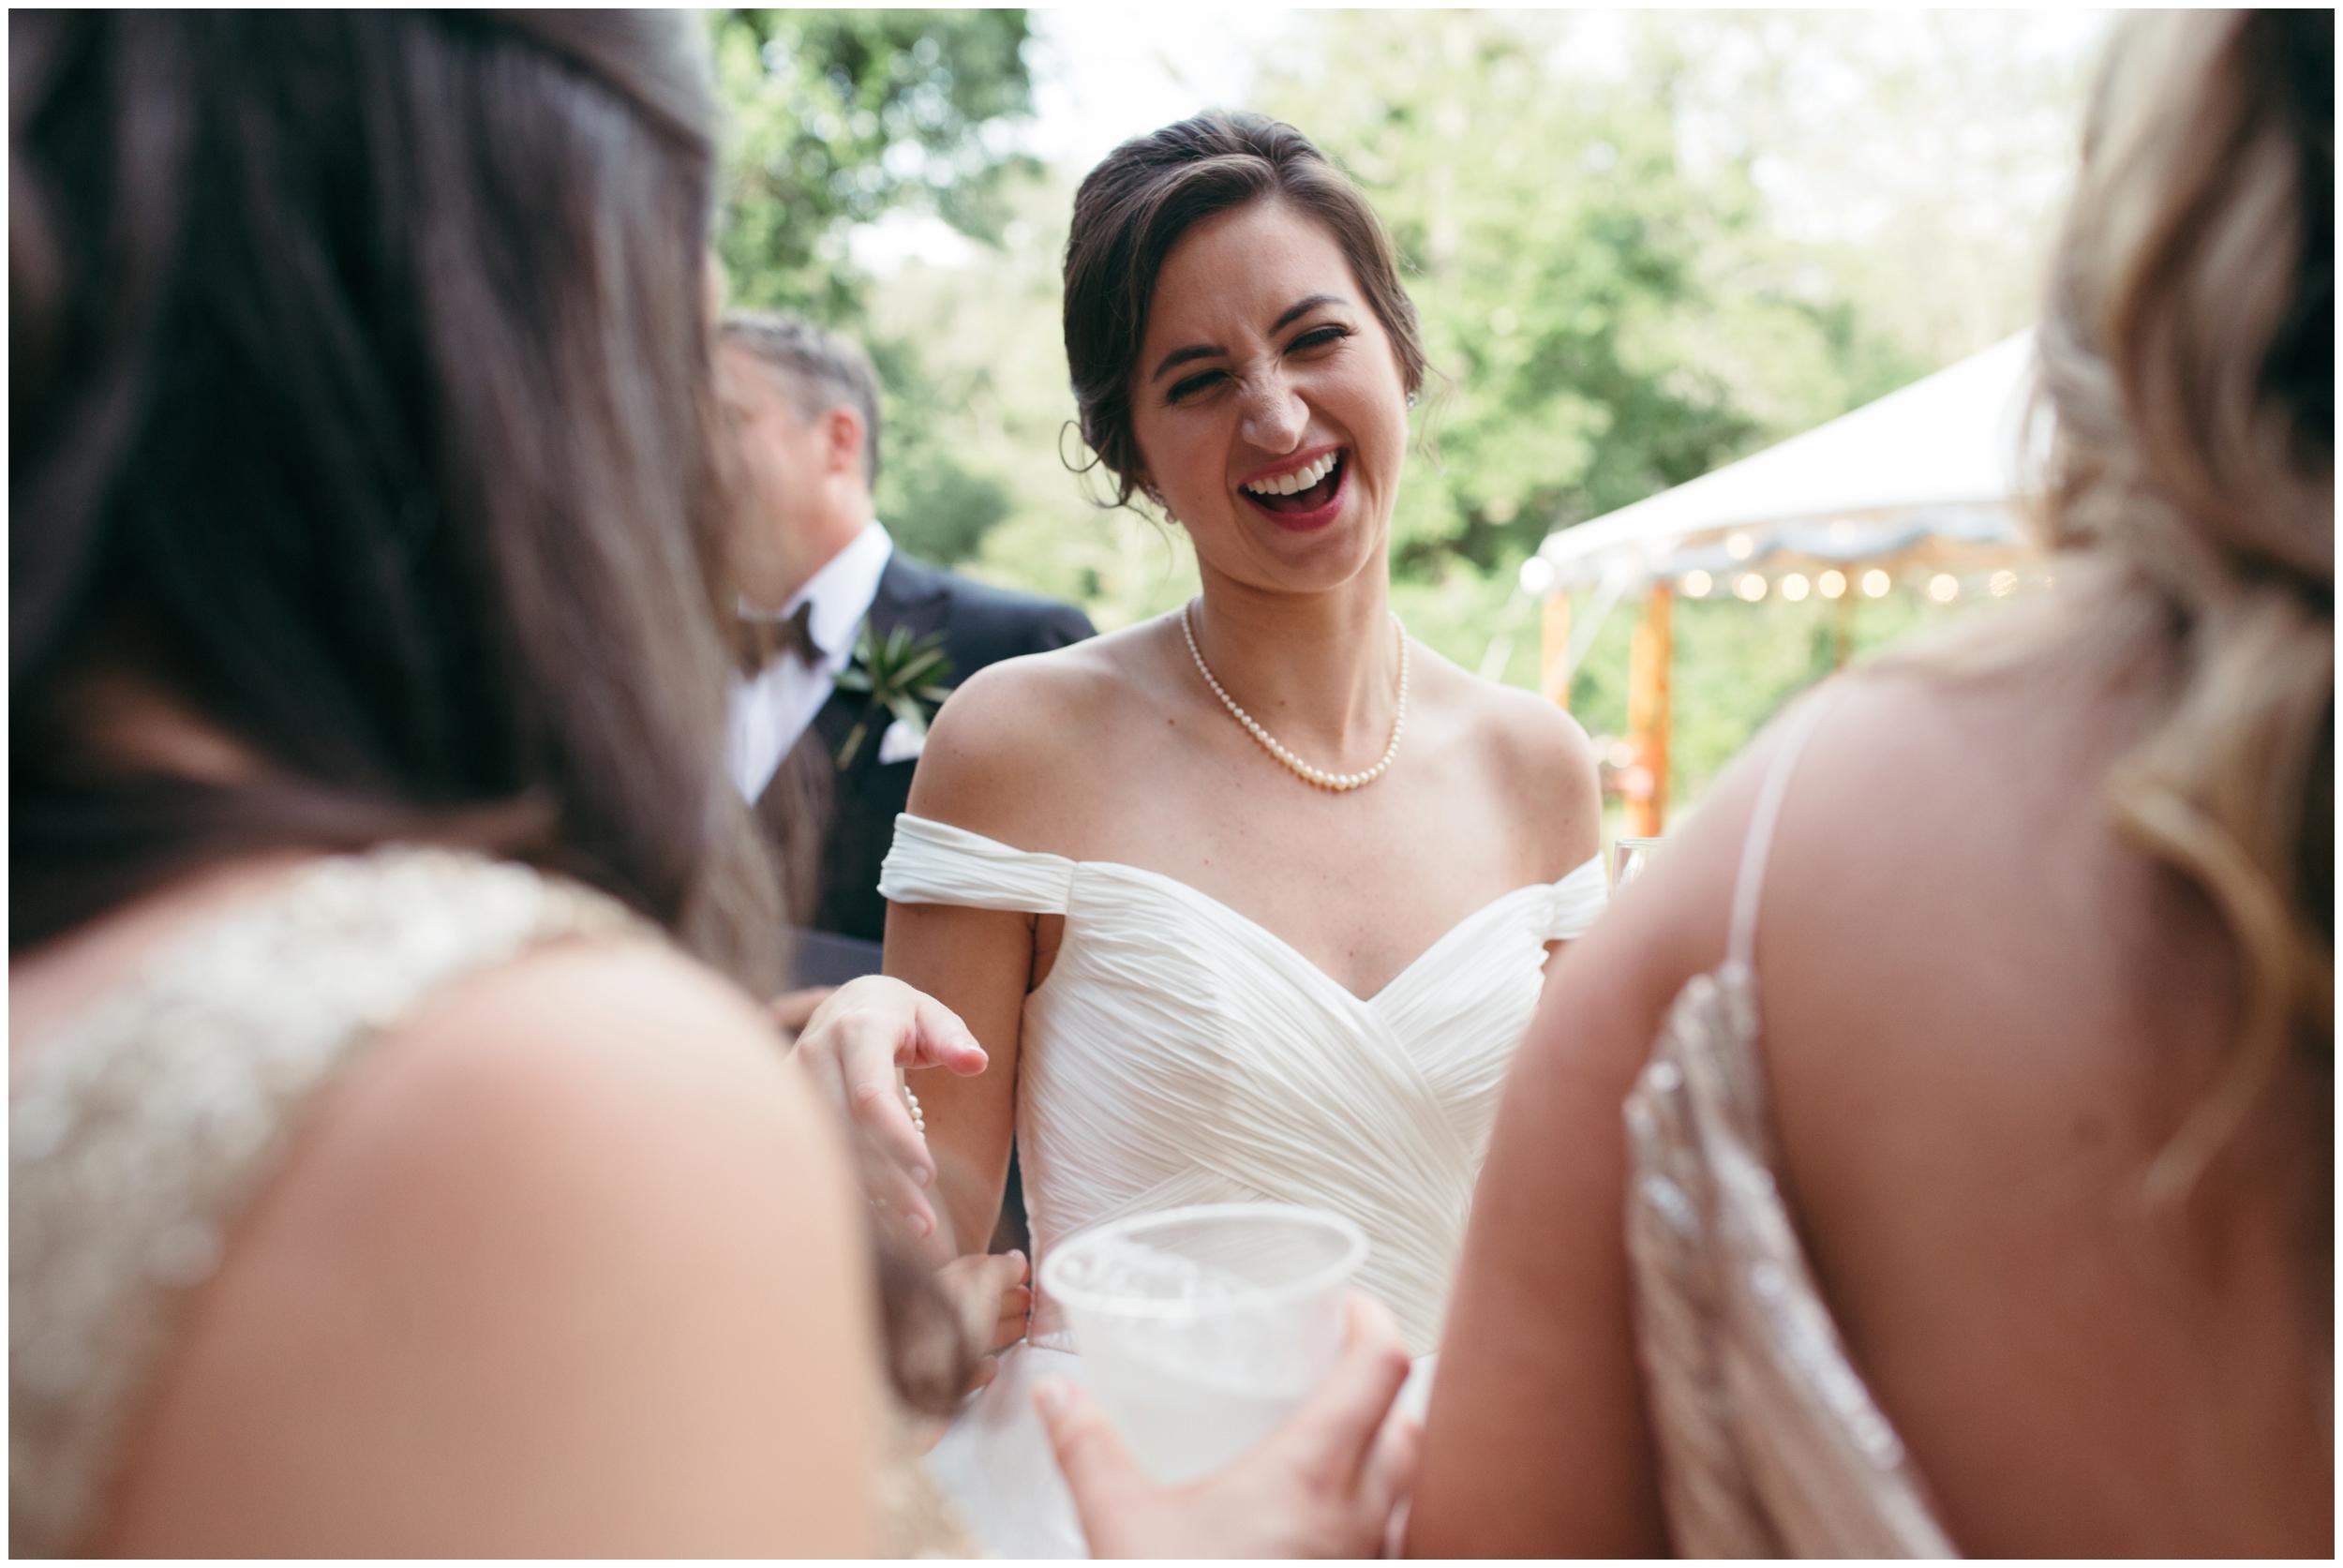 Willowdale-Estate-Wedding-Bailey-Q-Photo-Boston-Wedding-Photographer-049.JPG